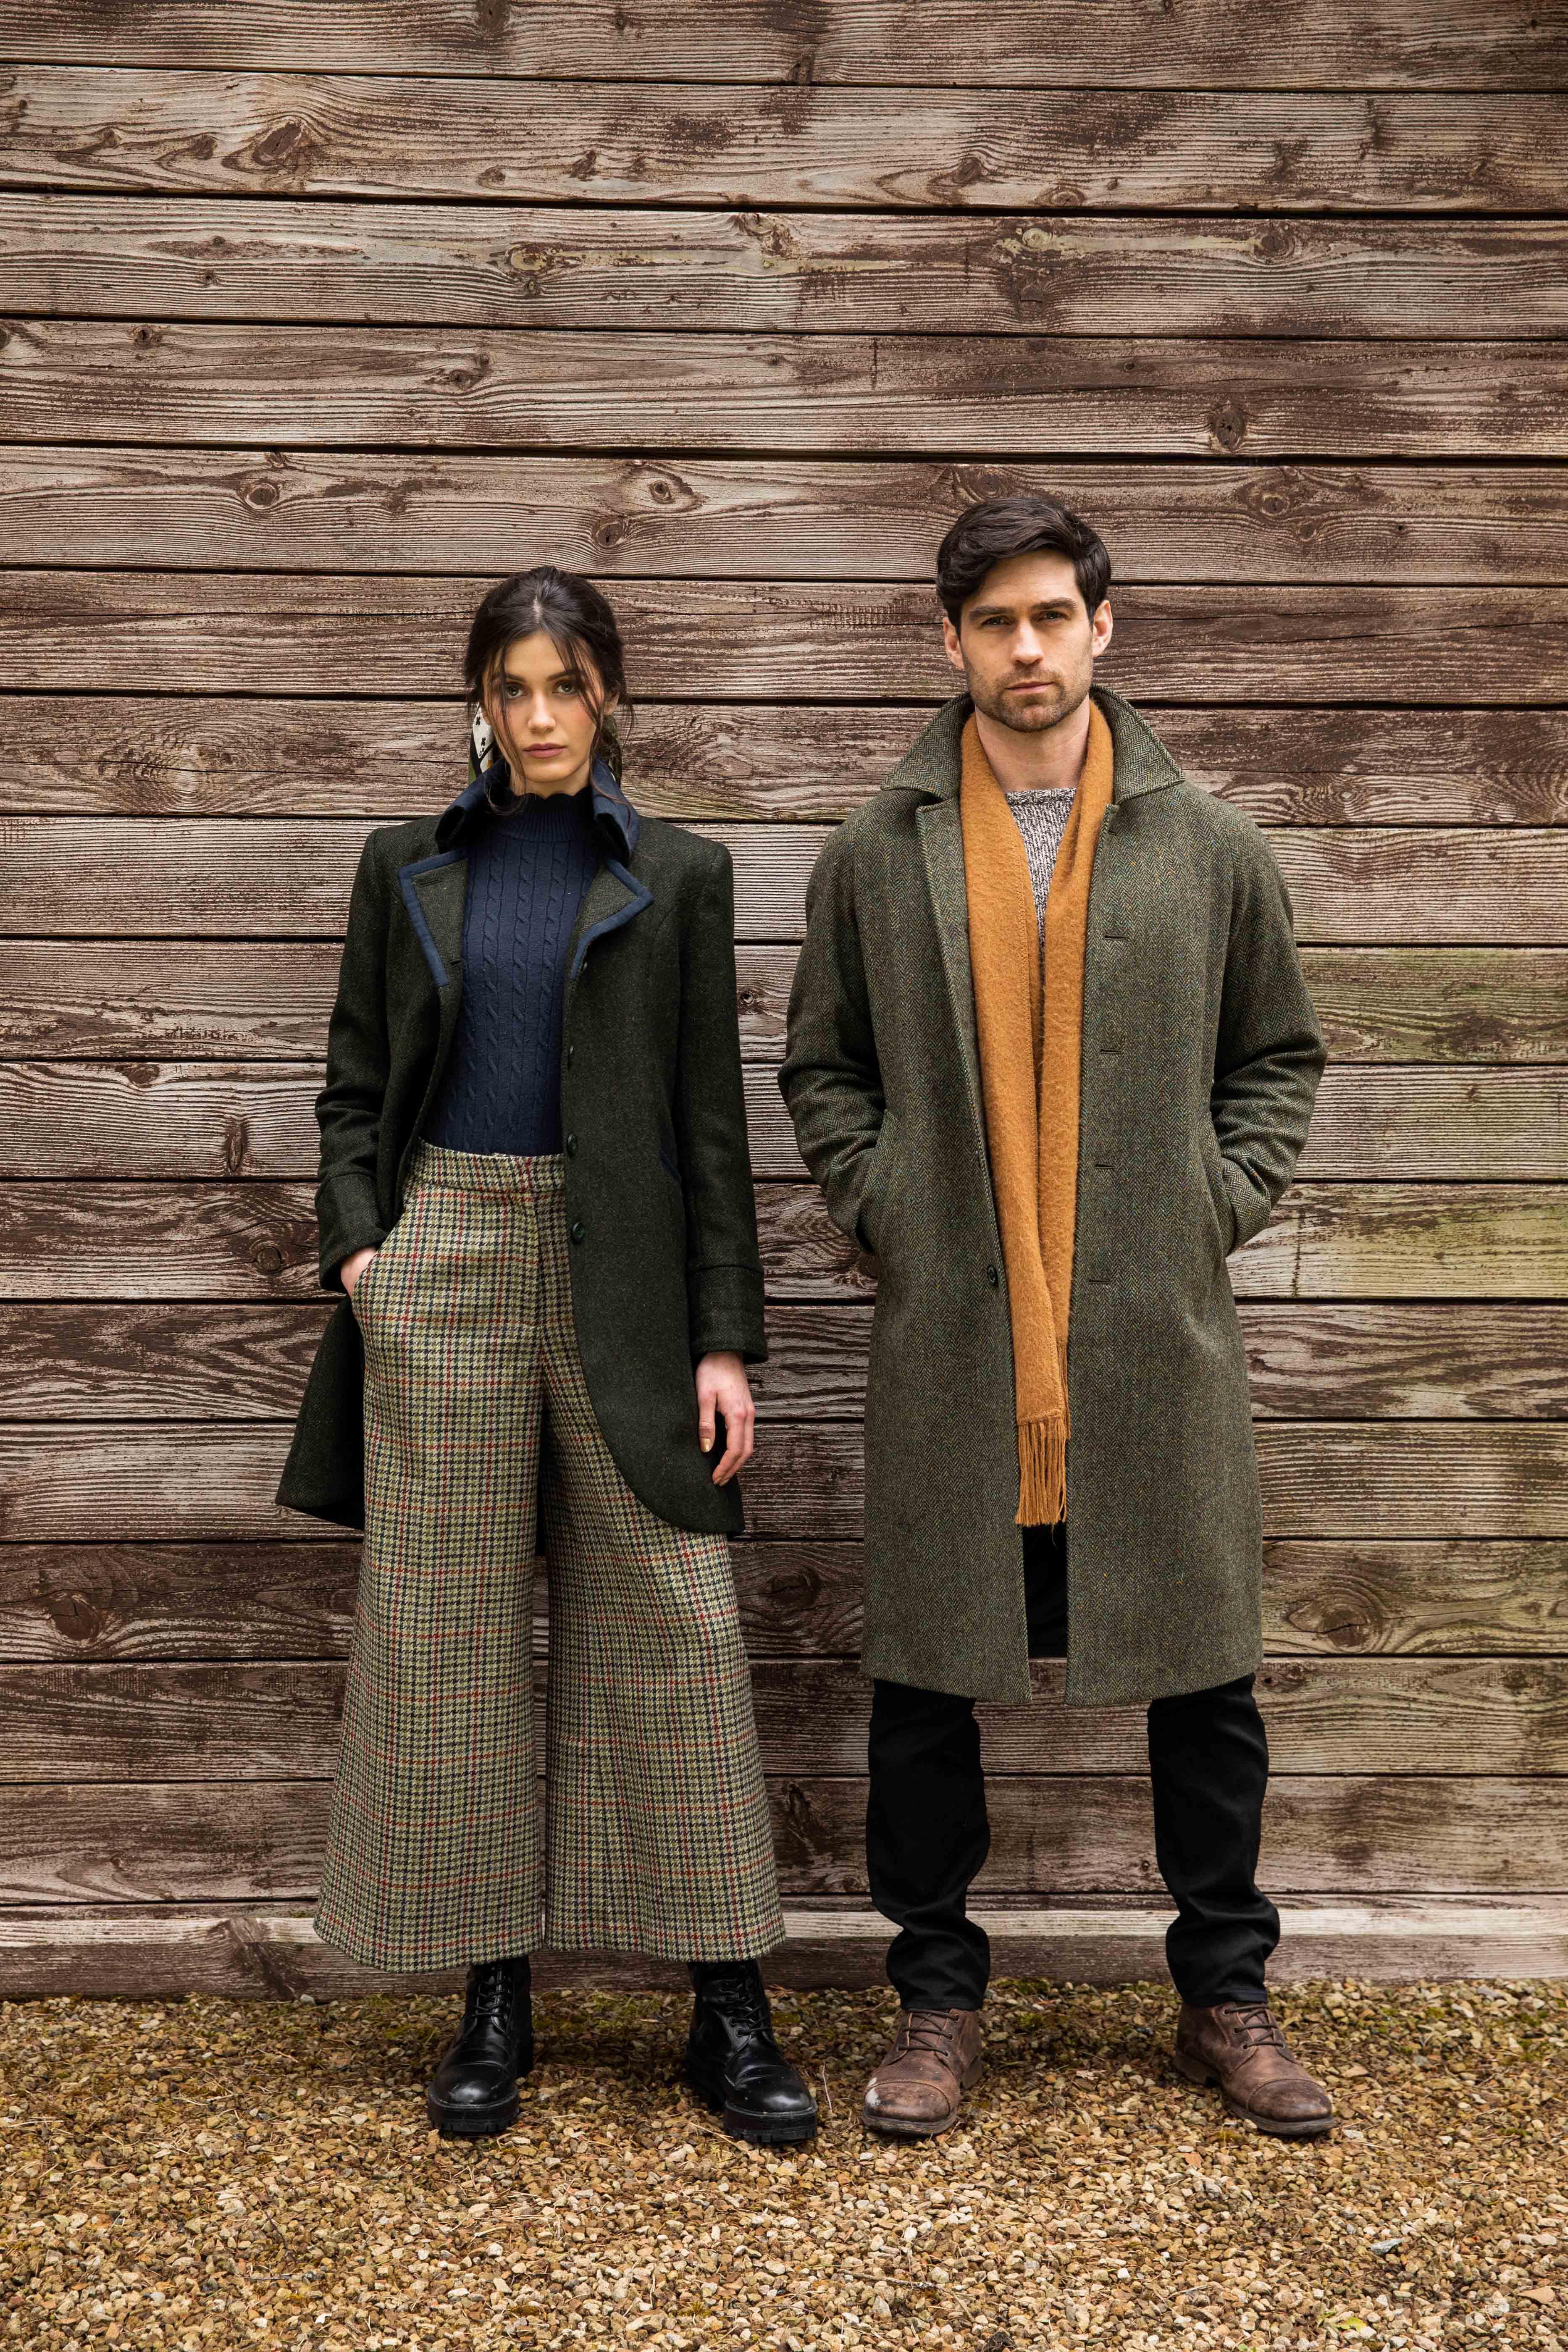 Jack Murphy Clothing Collaborates With Designer Deborah Veale For Autumn Winter 2021